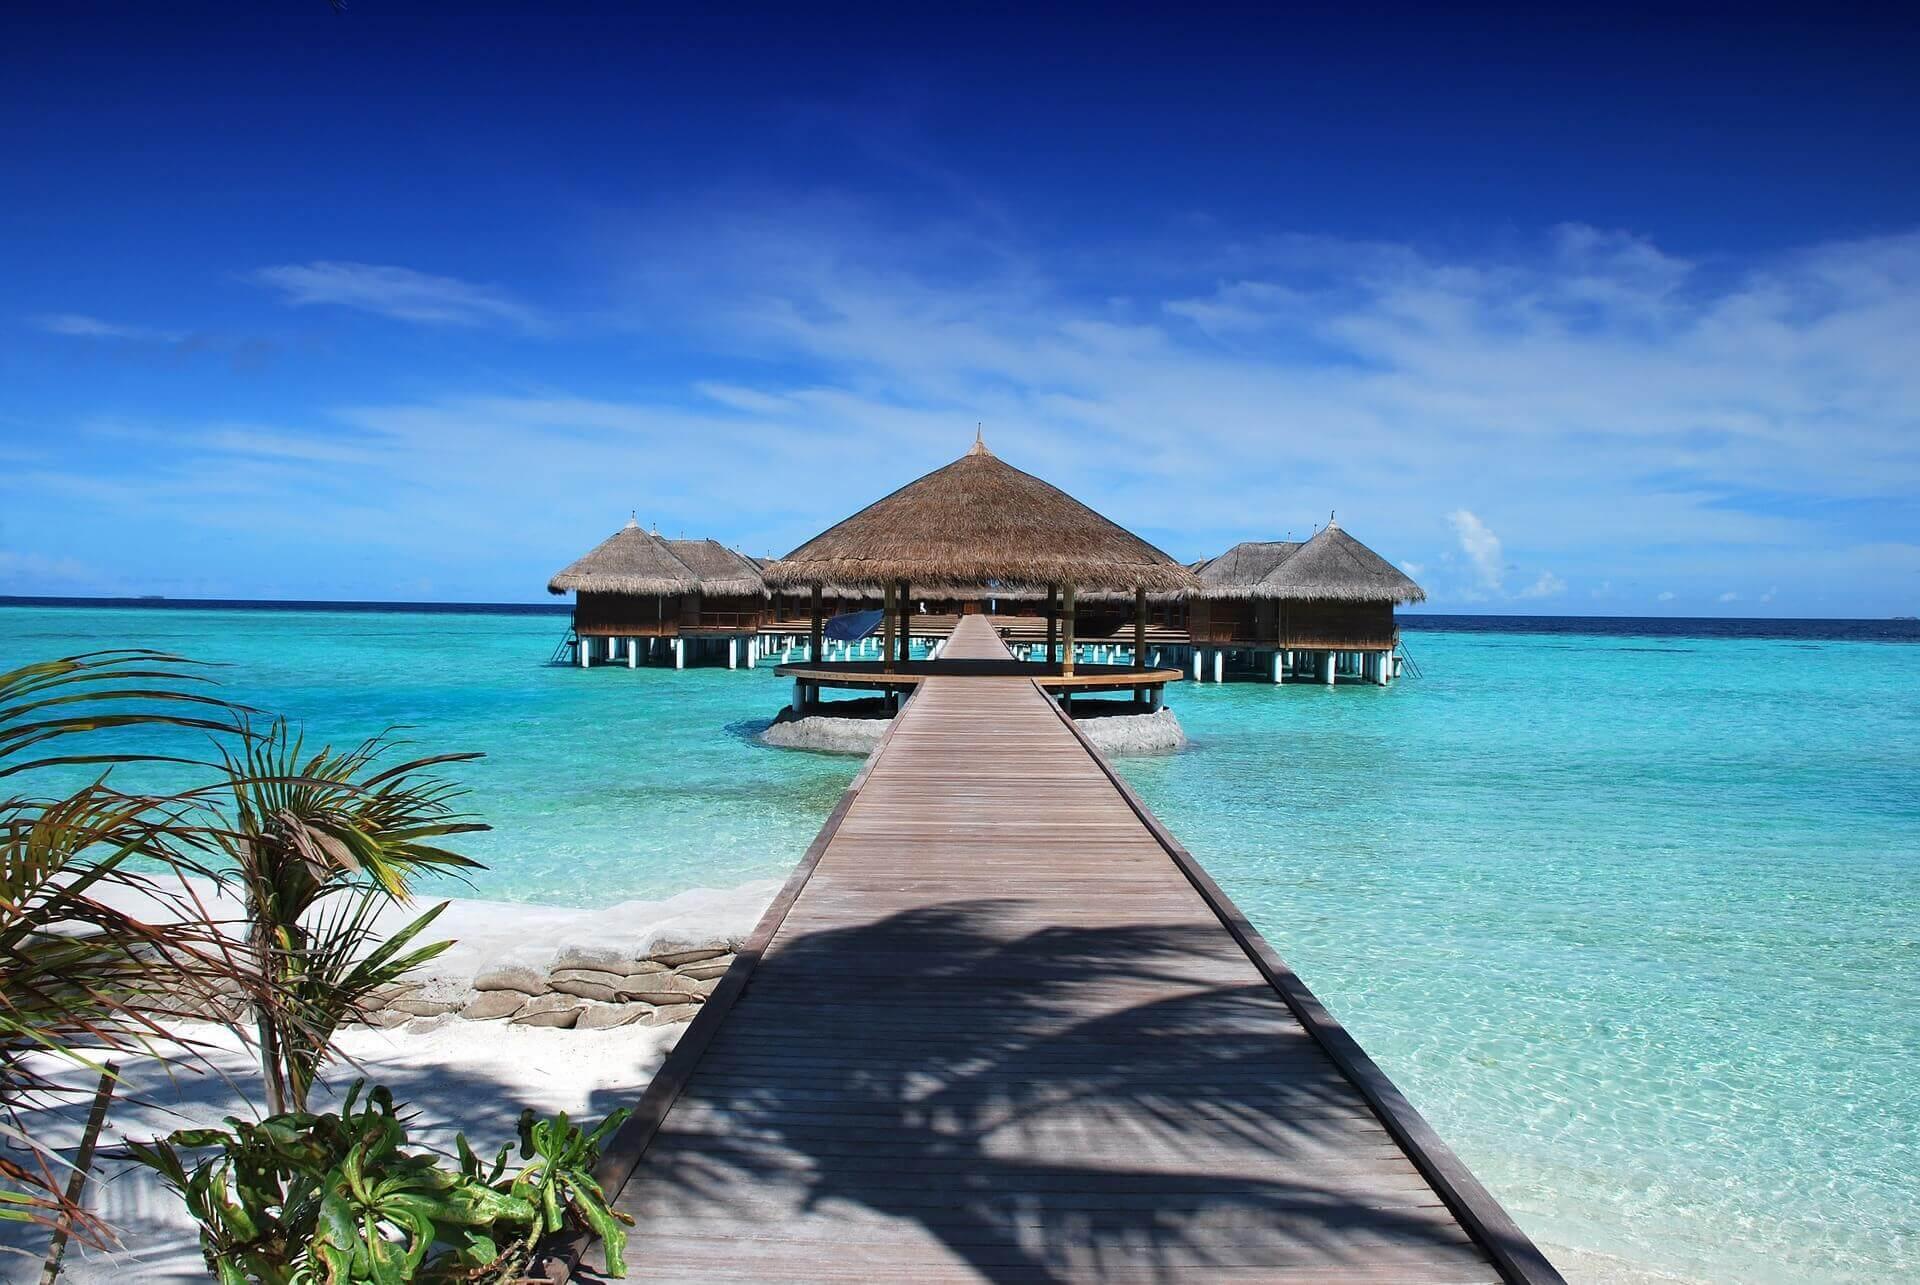 maldives-666122_1920 (1) (1) (1)